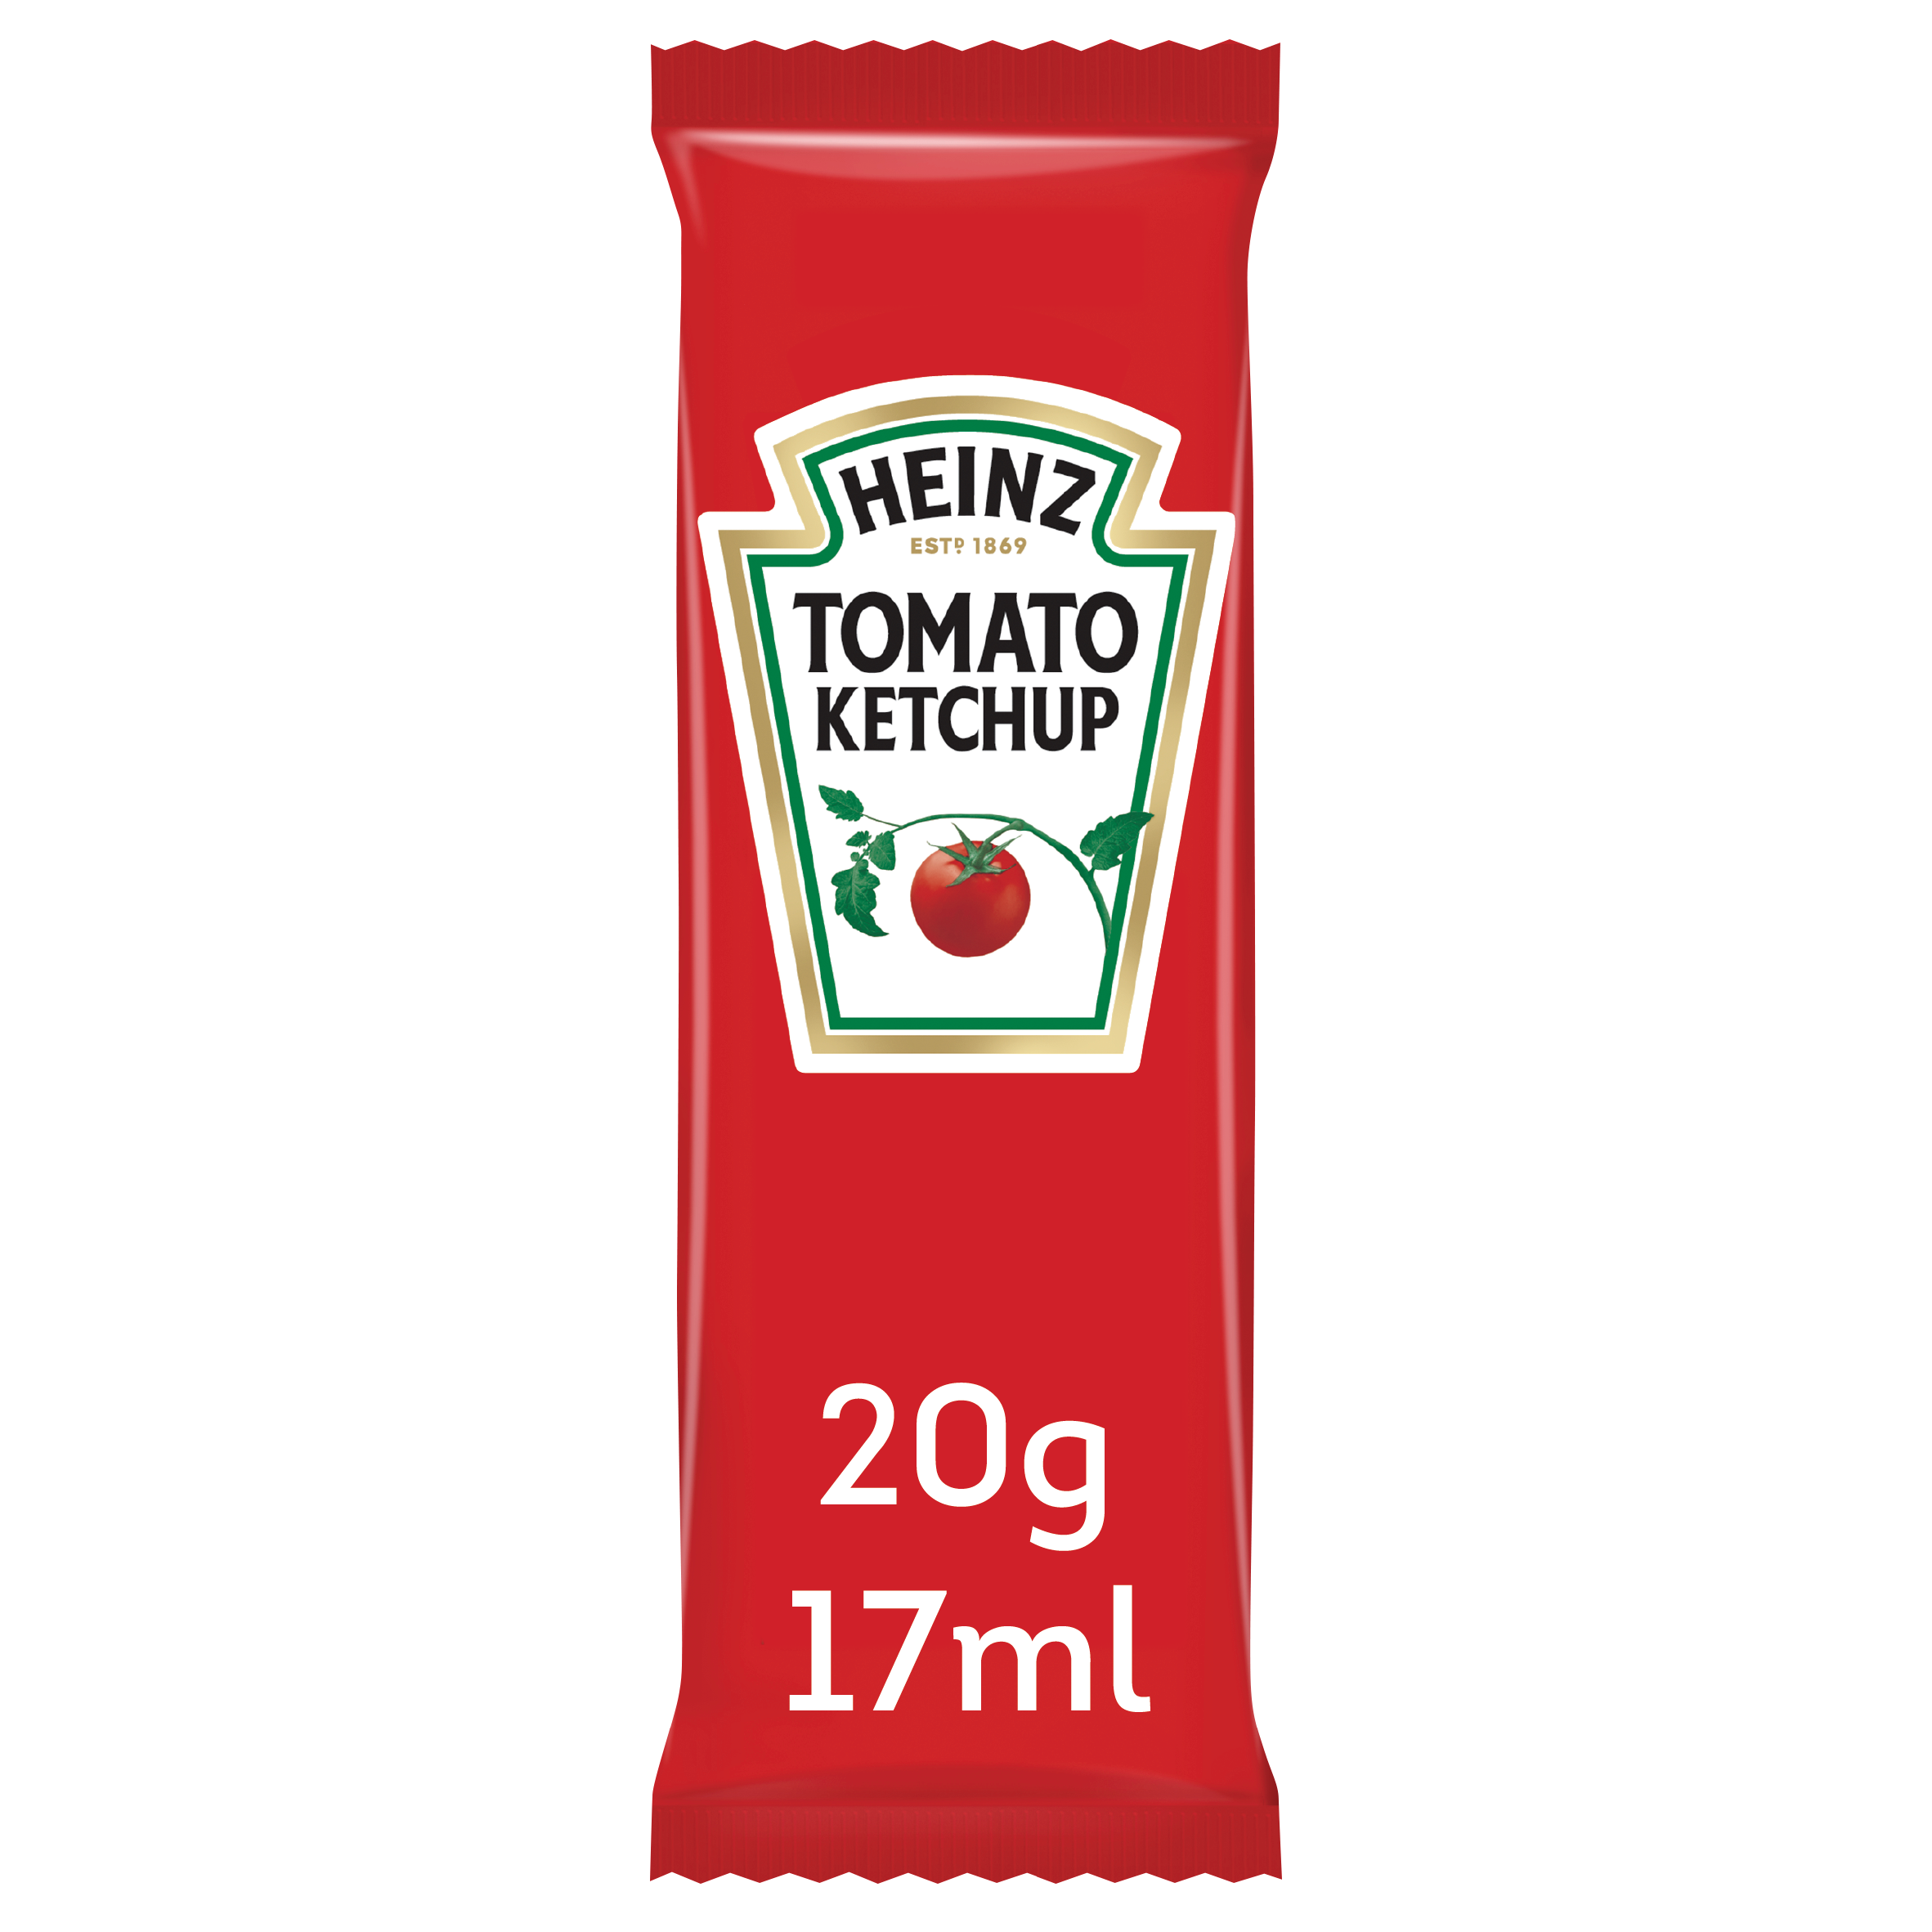 Heinz Tomaten Ketchup 17ml image